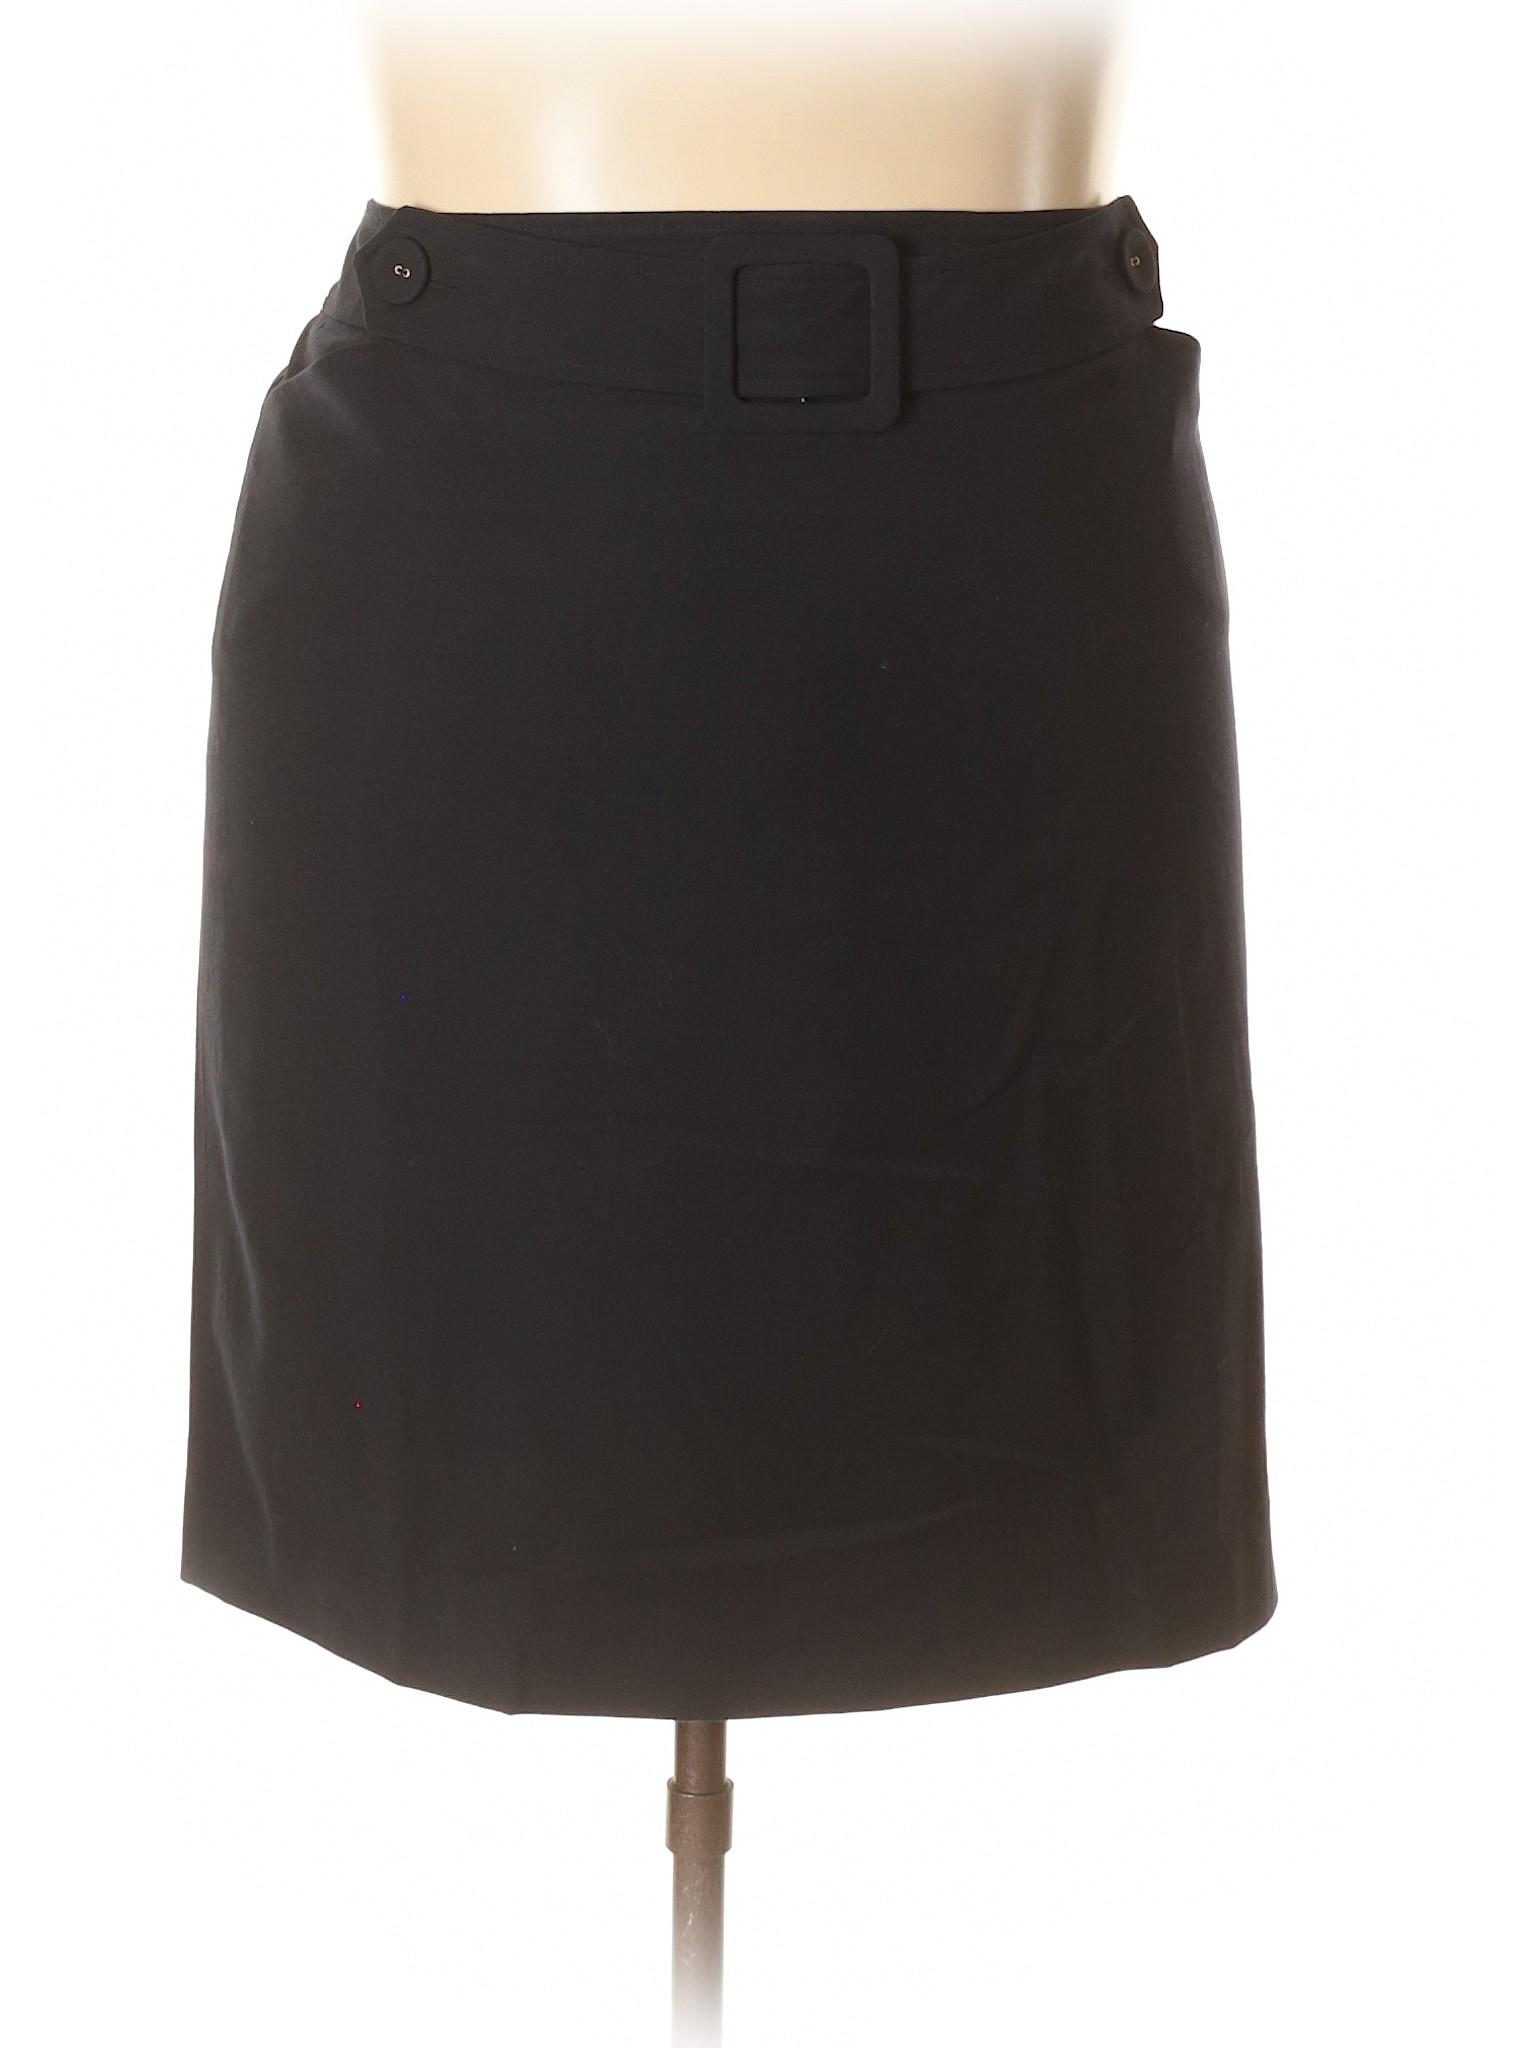 Skirt Casual Boutique leisure Talbots Boutique leisure Talbots qUTxYHU